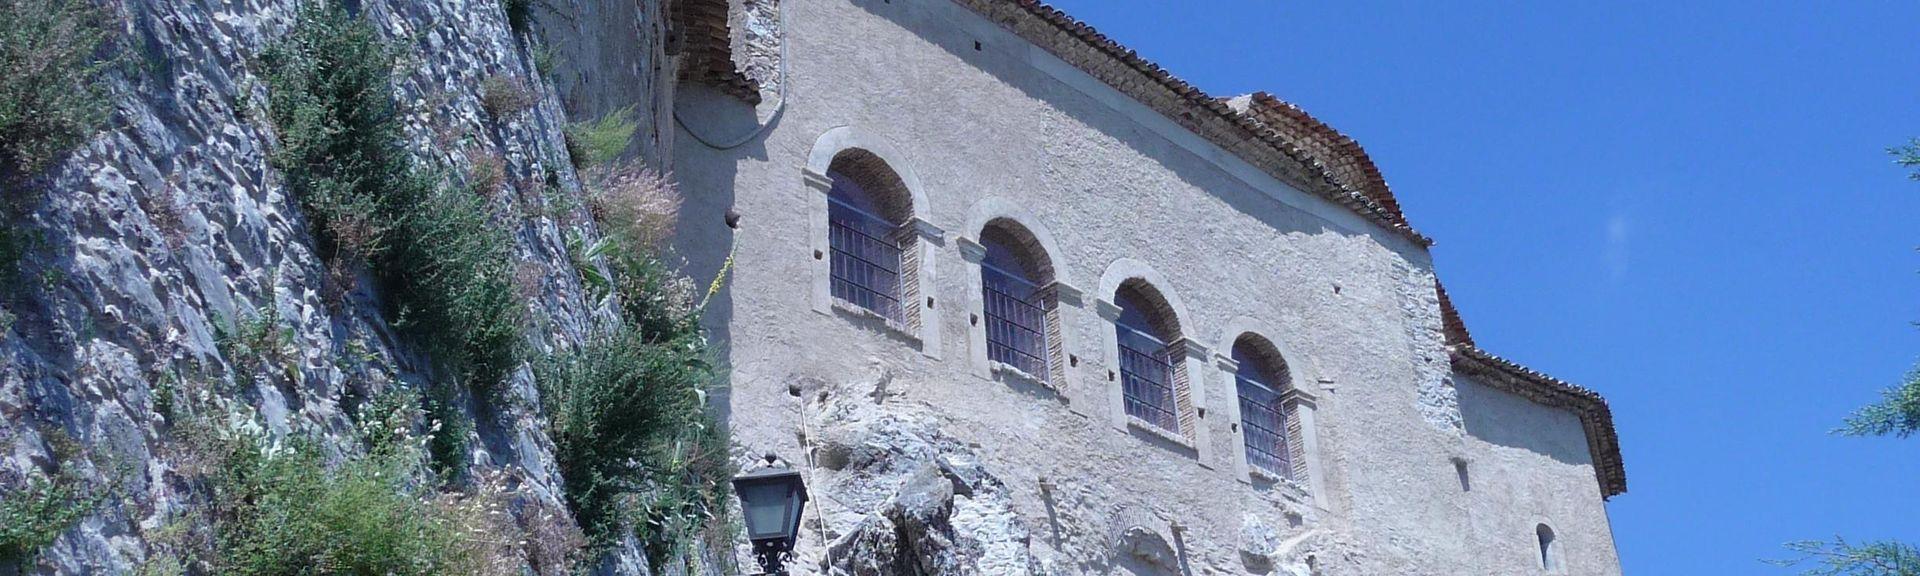 Mirto, Crosia, Calabria, Italy